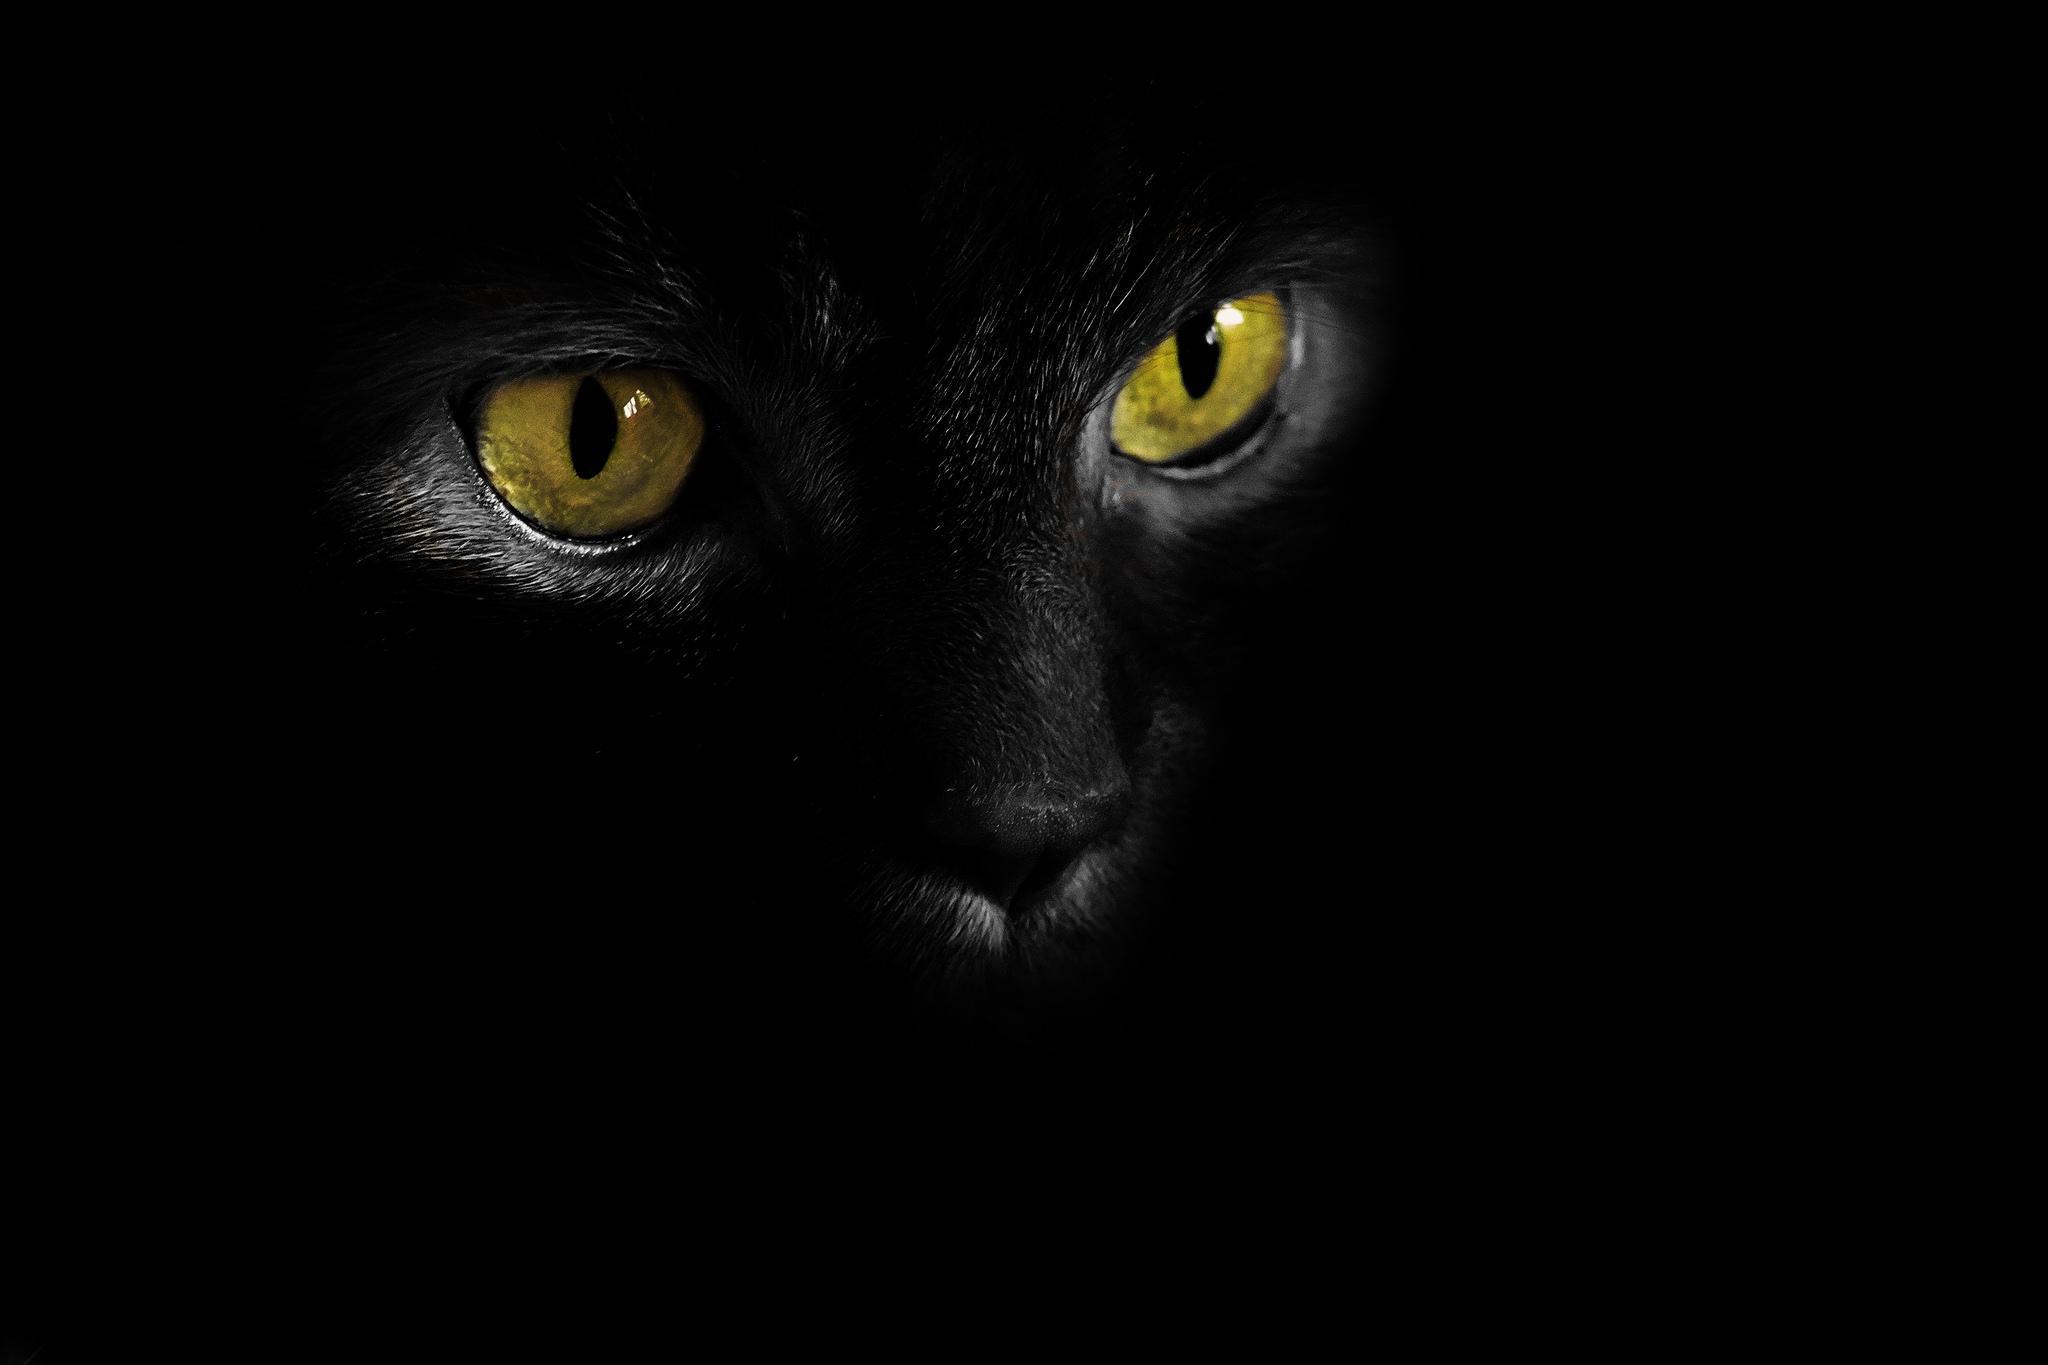 обои ночь, морда, кошка, кот картинки фото